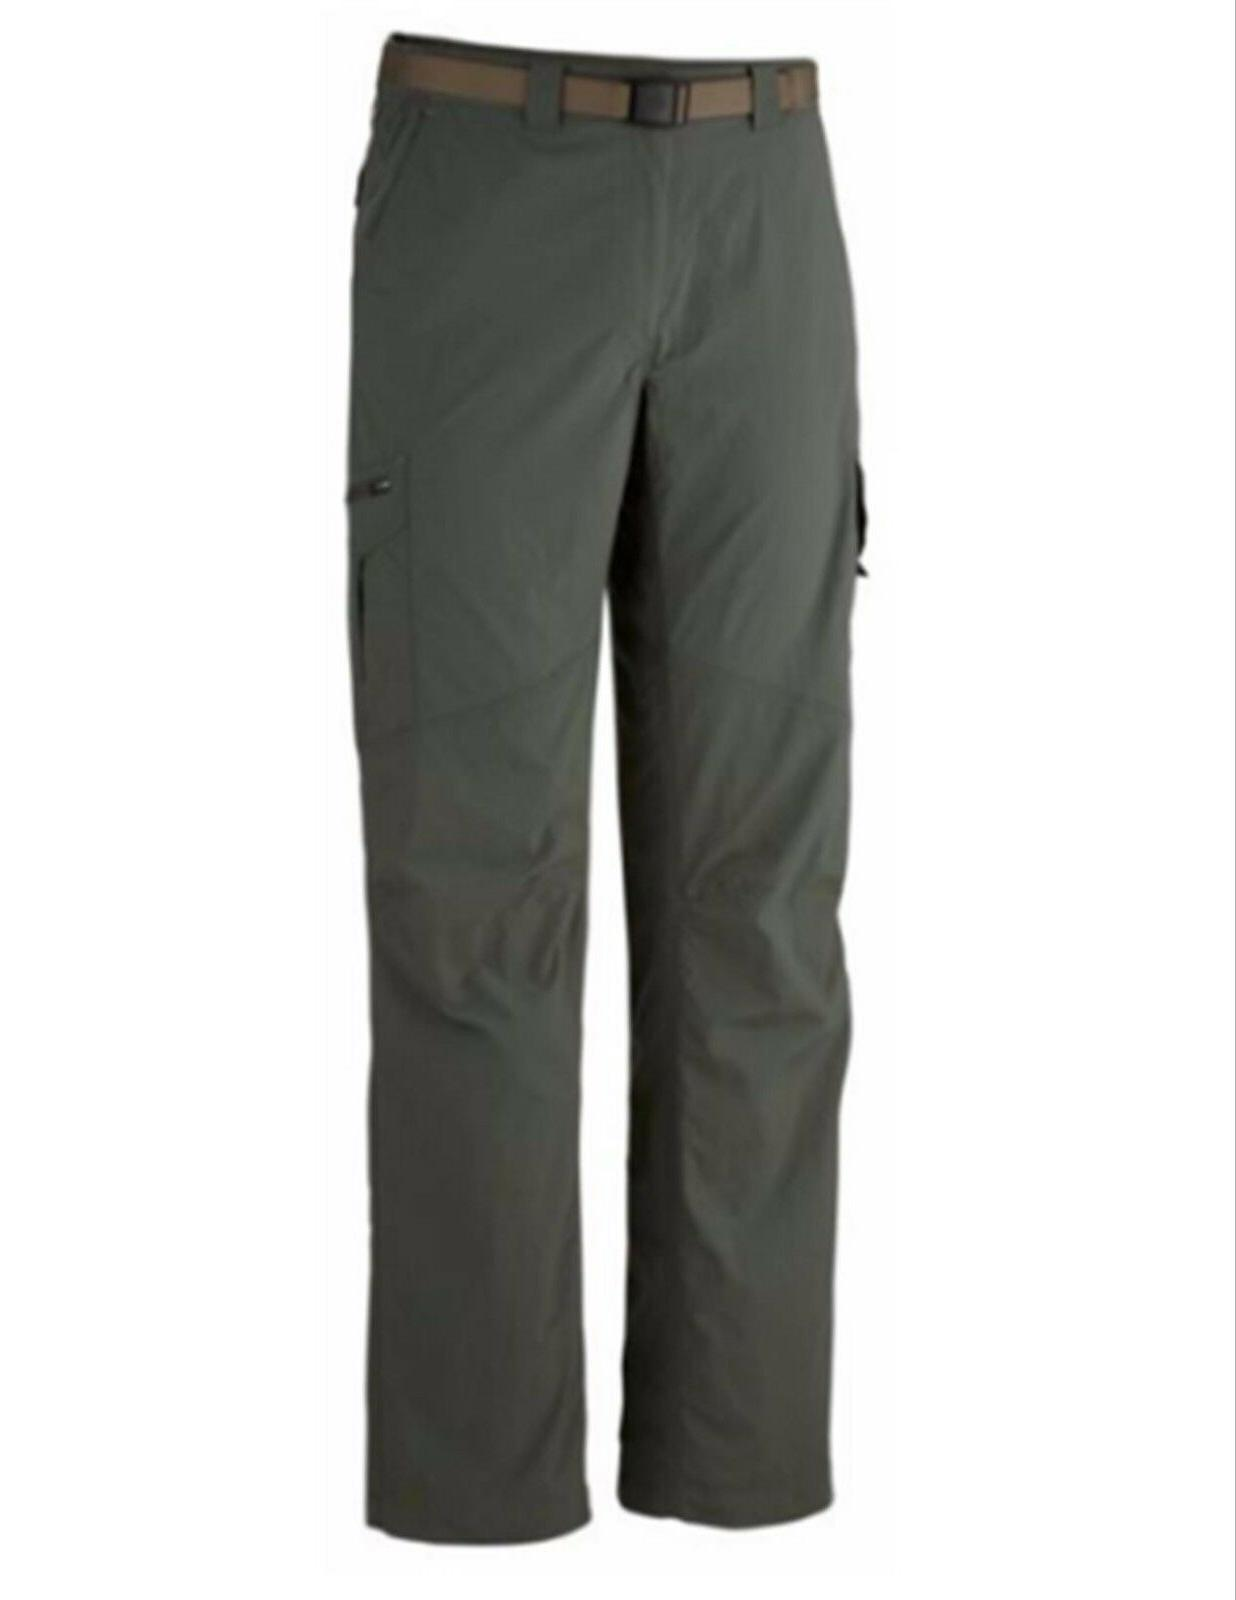 New Columbia Men's Kestrel Trail Pants UPF 50 ~ Gray ~ Choos